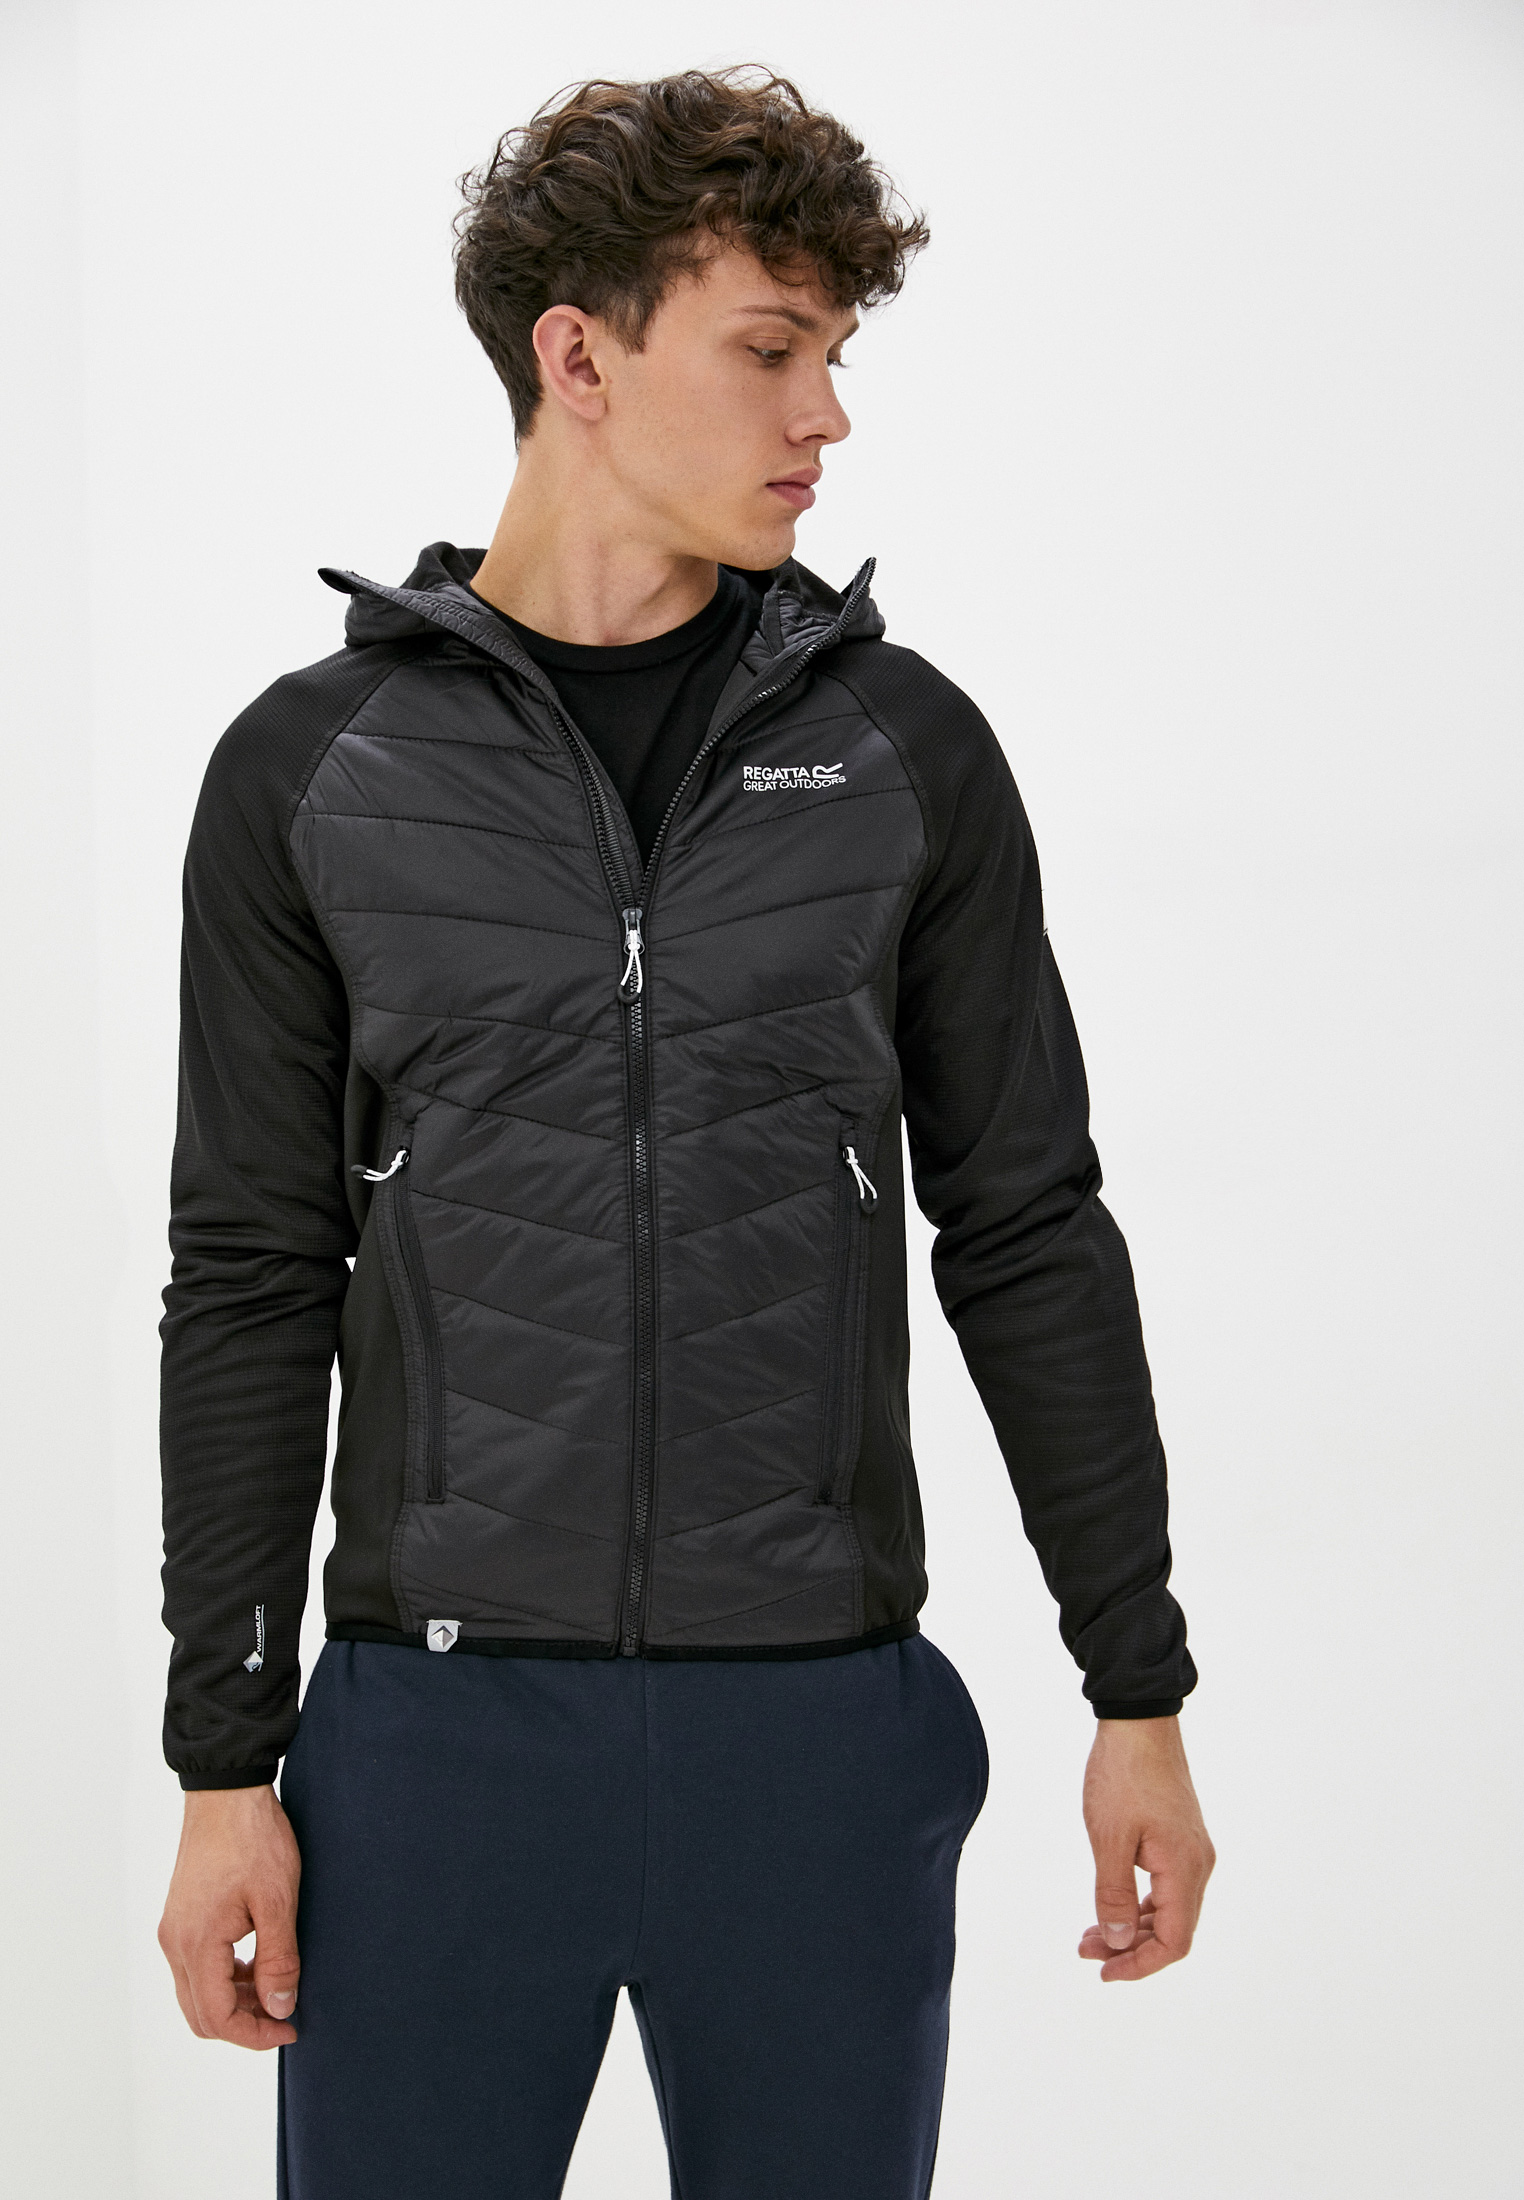 Мужская верхняя одежда Regatta (Регатта) RMN158